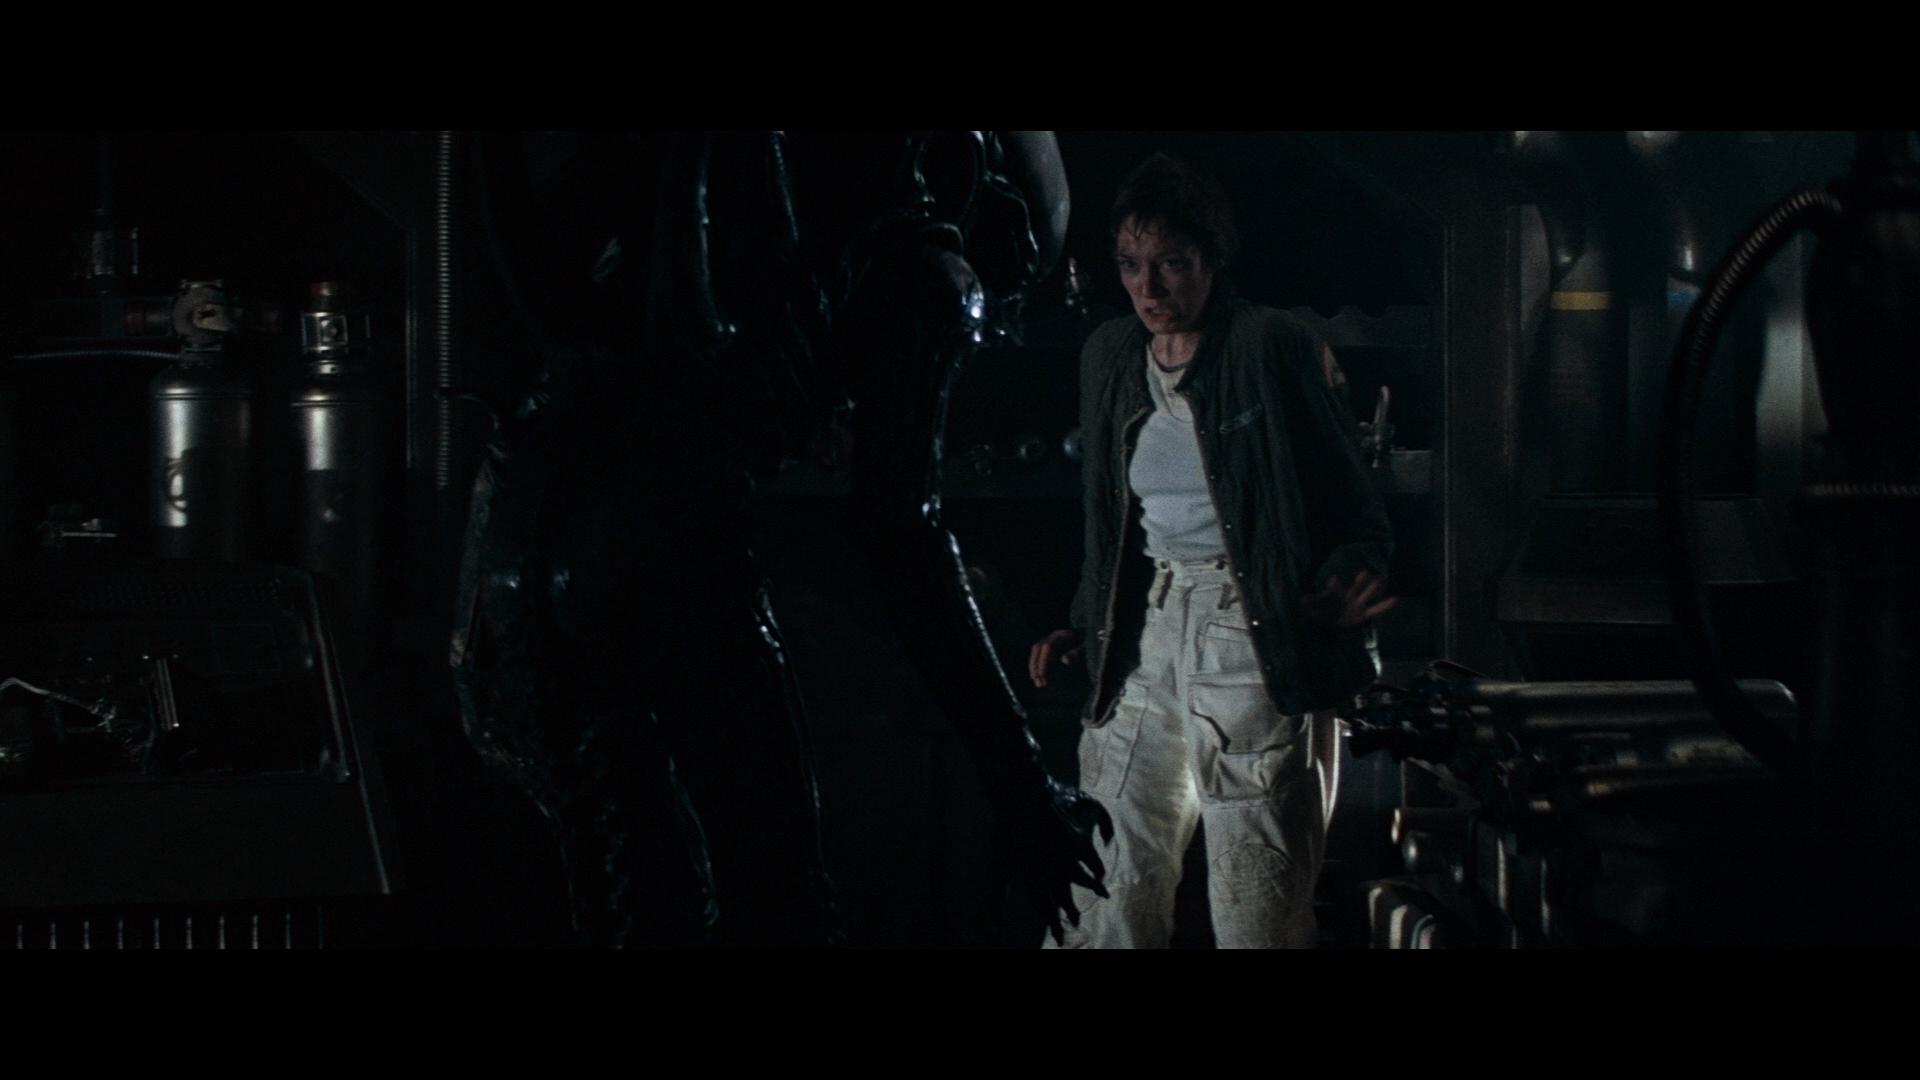 ALIEN (1979) - Nostromo Crew Trousers - Image 8 of 9